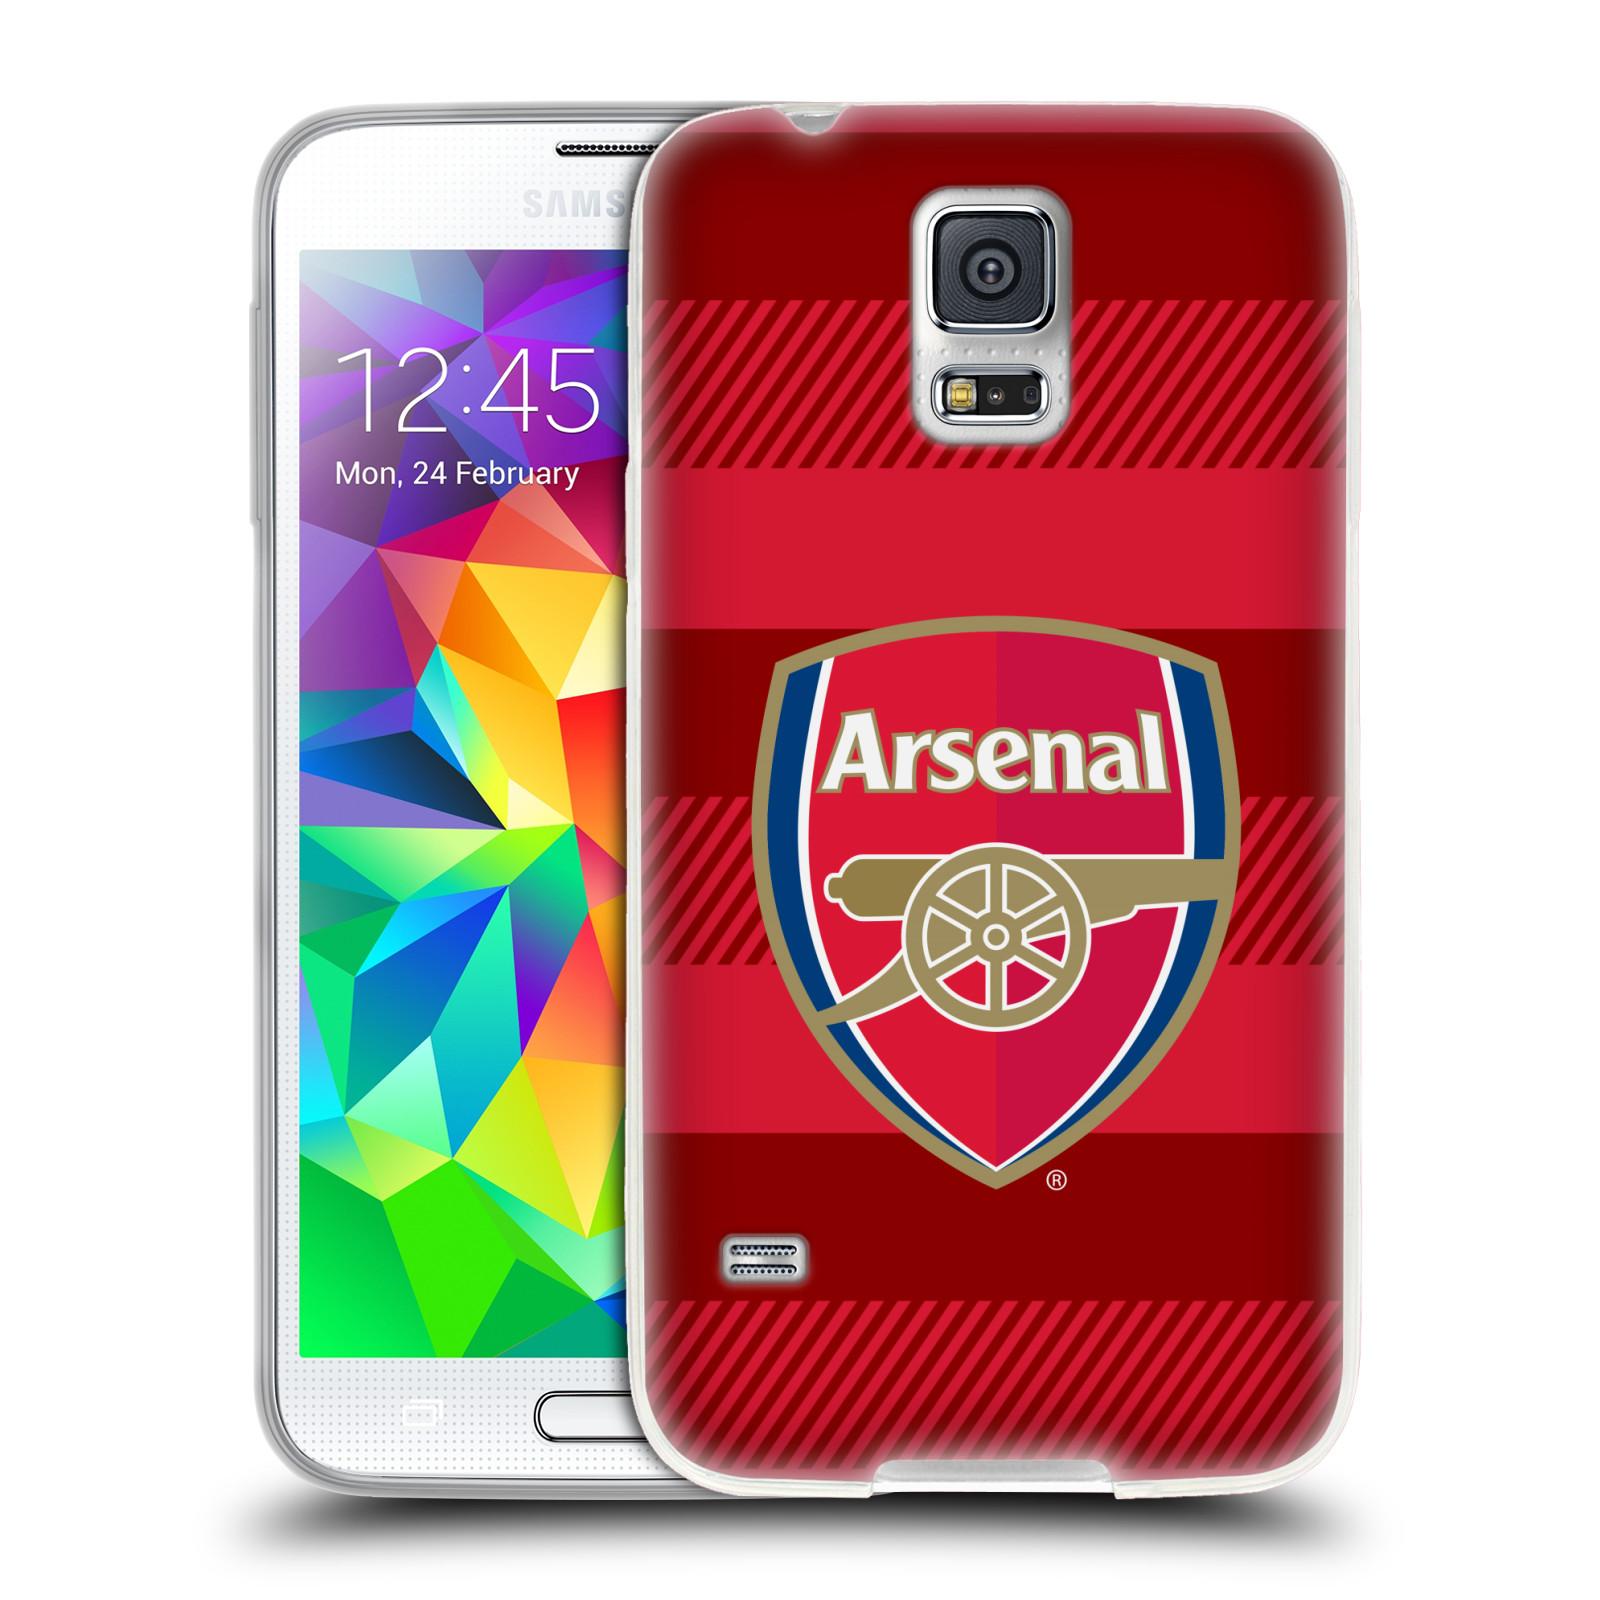 Silikonové pouzdro na mobil Samsung Galaxy S5 - Head Case - Arsenal FC - Logo s pruhy